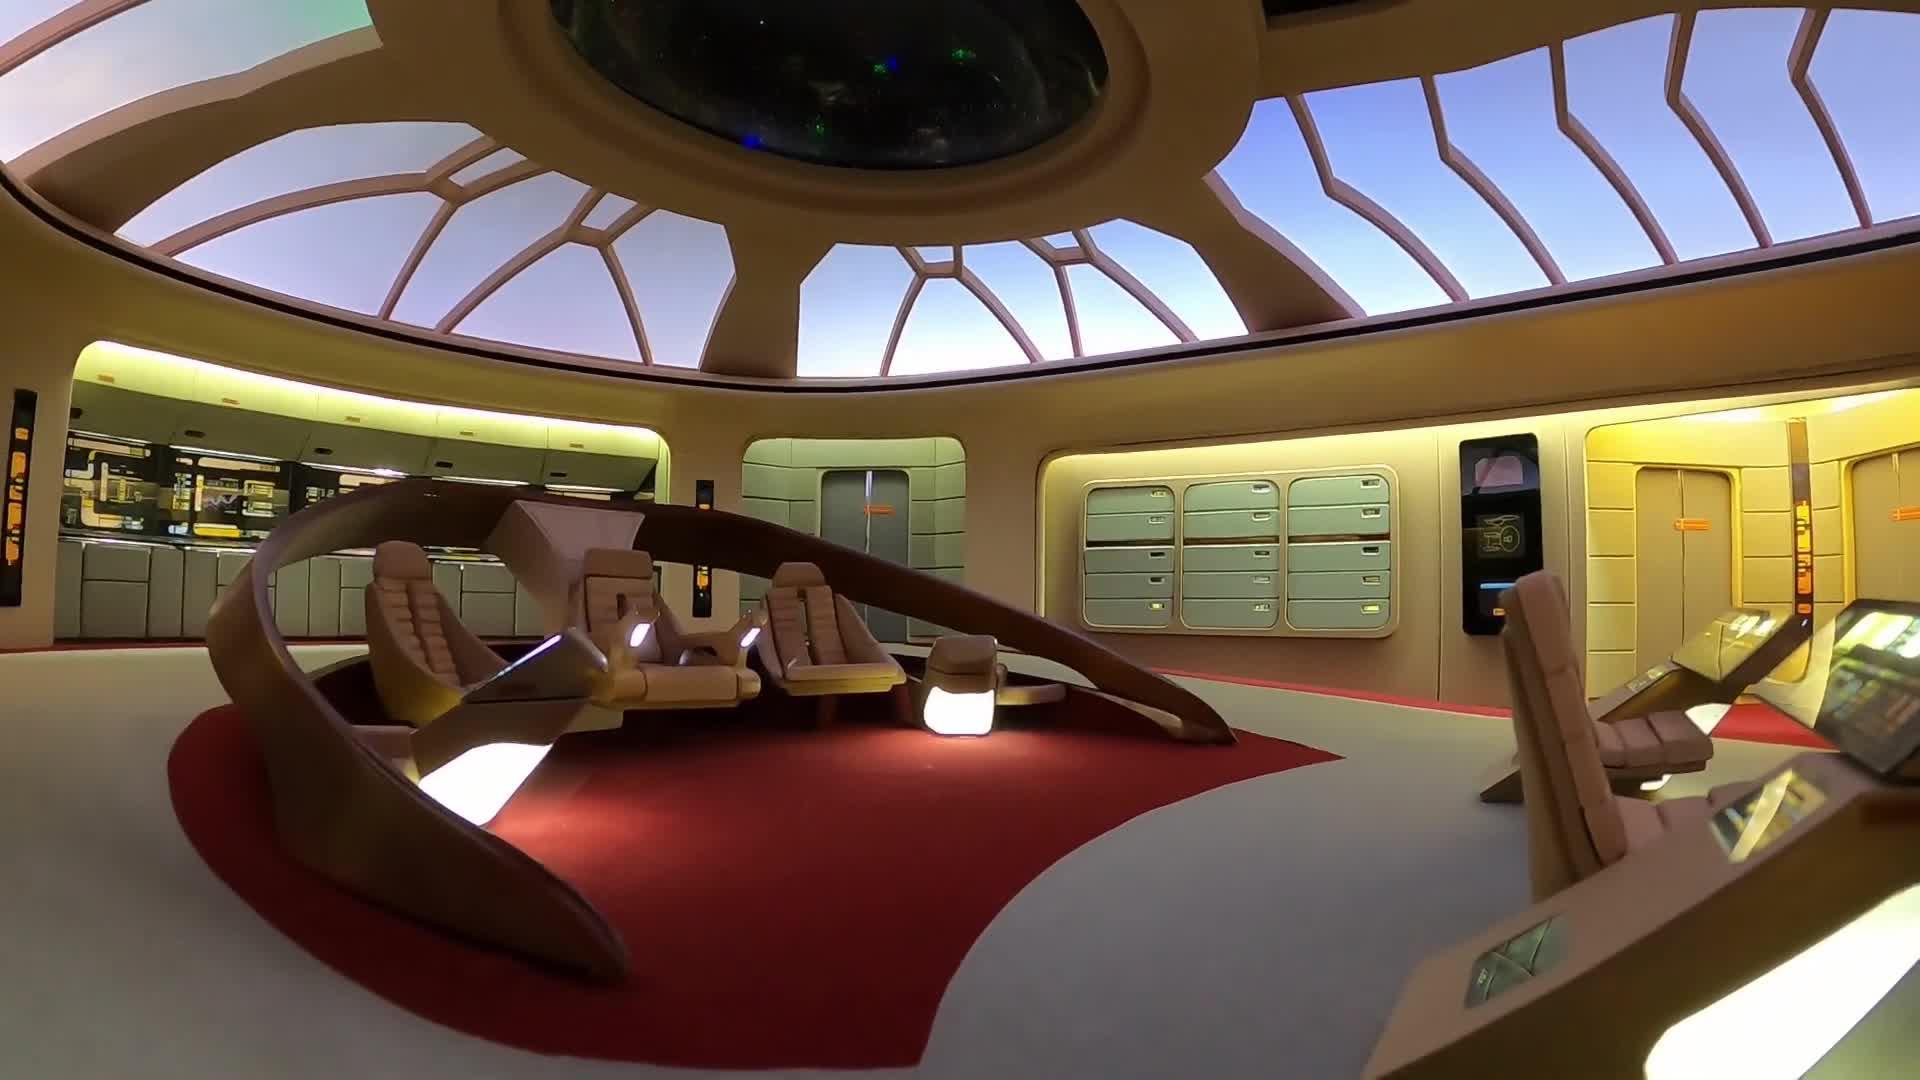 Star Trek, Modell, Enterprise-D, Star Trek The Next Generation, Geoff Collard, Enterprise D, Modellbau